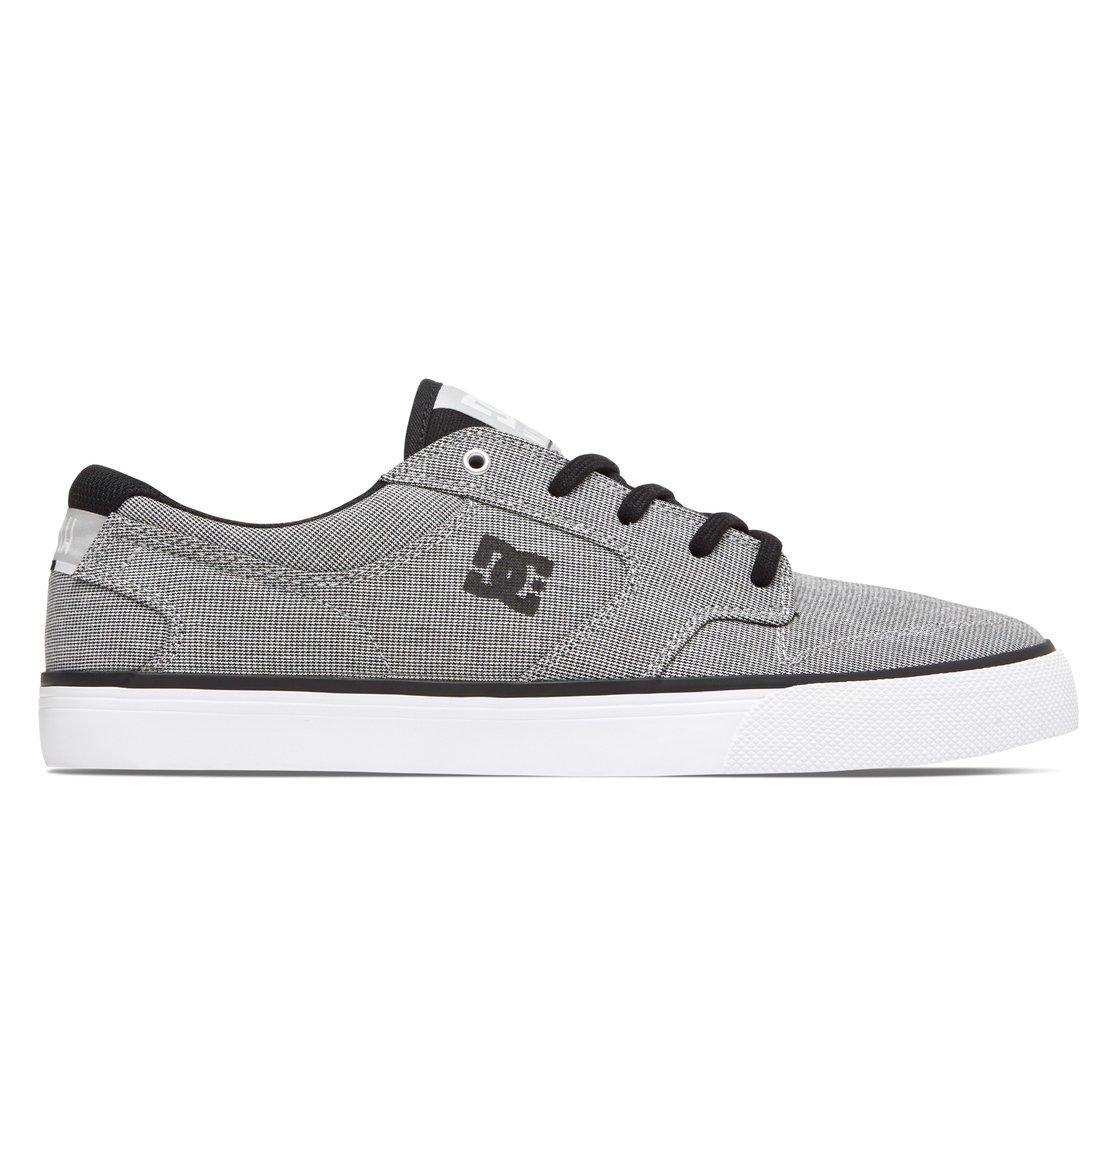 Nyjah Huston Shoes Uk